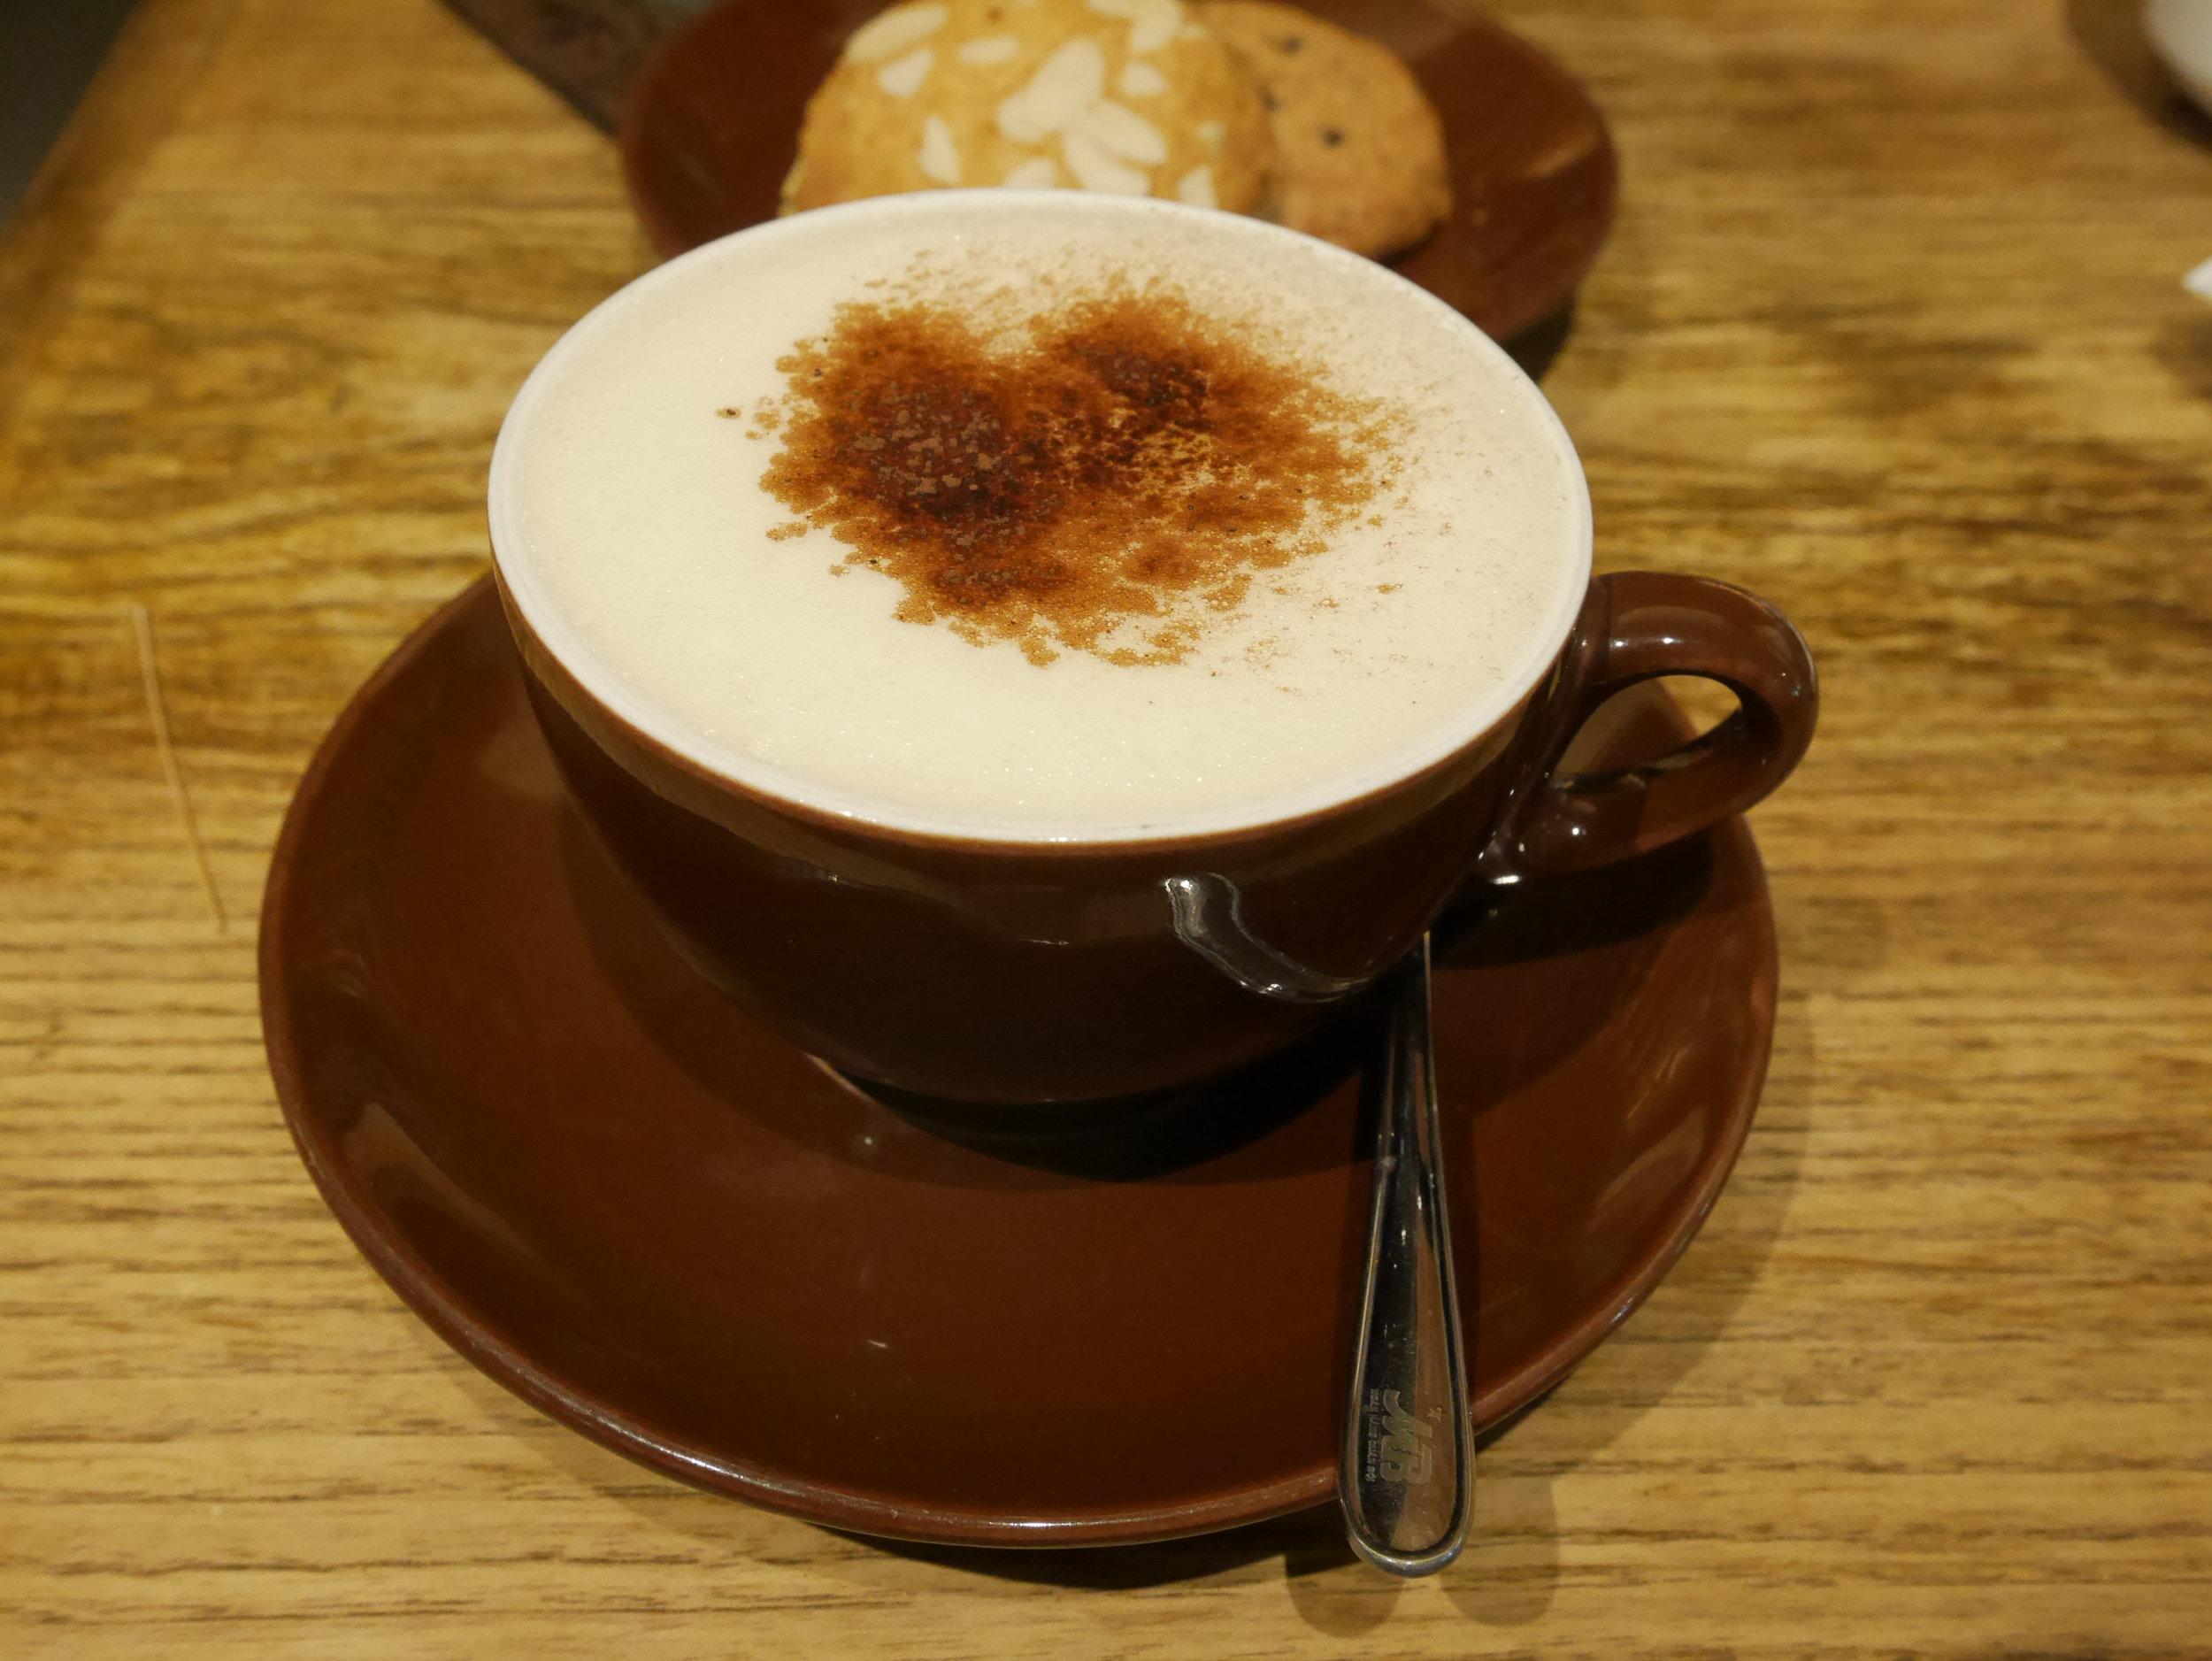 Delicious foamy egg coffee of Haka Coffee shop